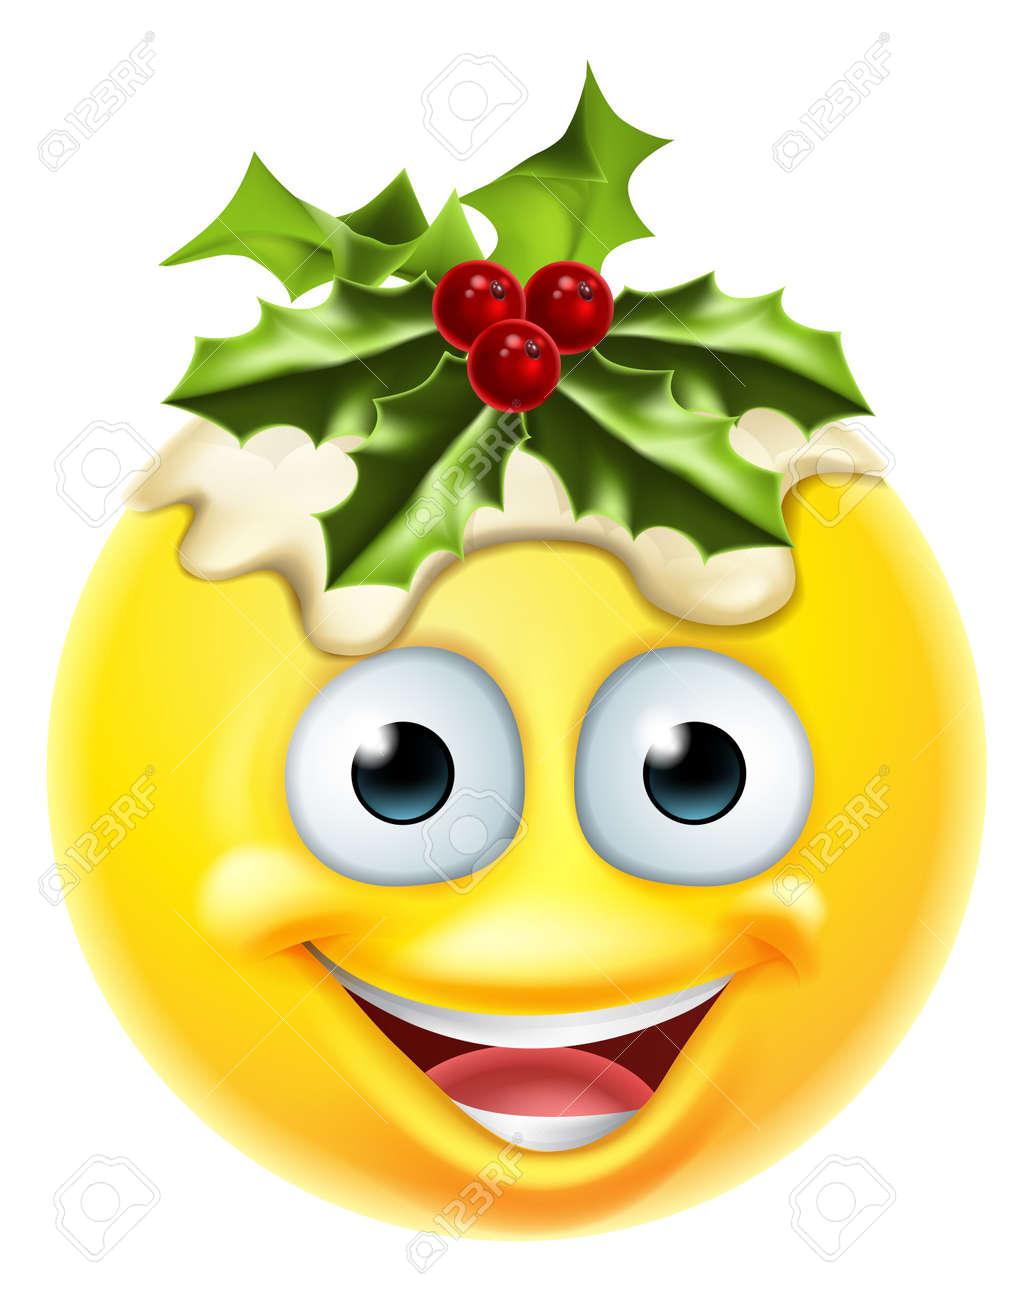 A Christmas pudding festive emoticon emoji character